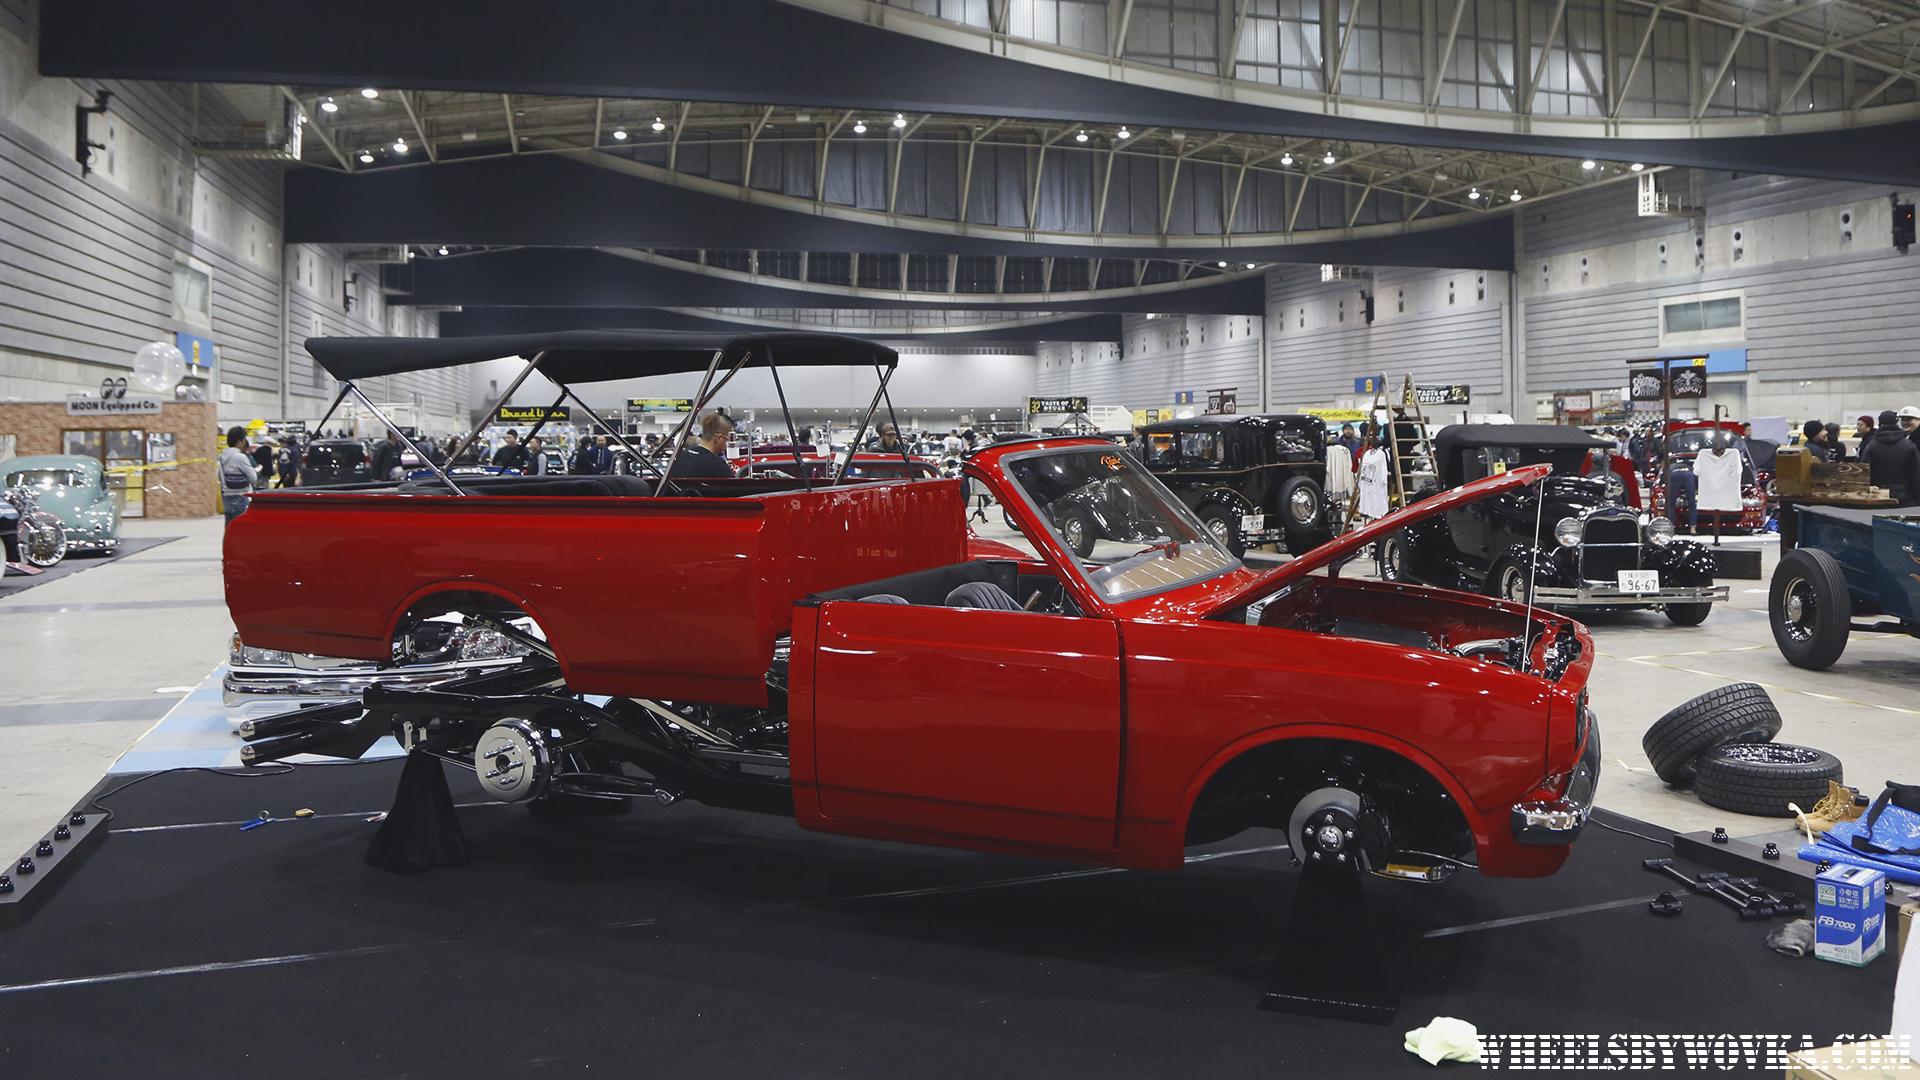 mooneyes-yokohama-hot-rod-custom-show-cars-2017-10